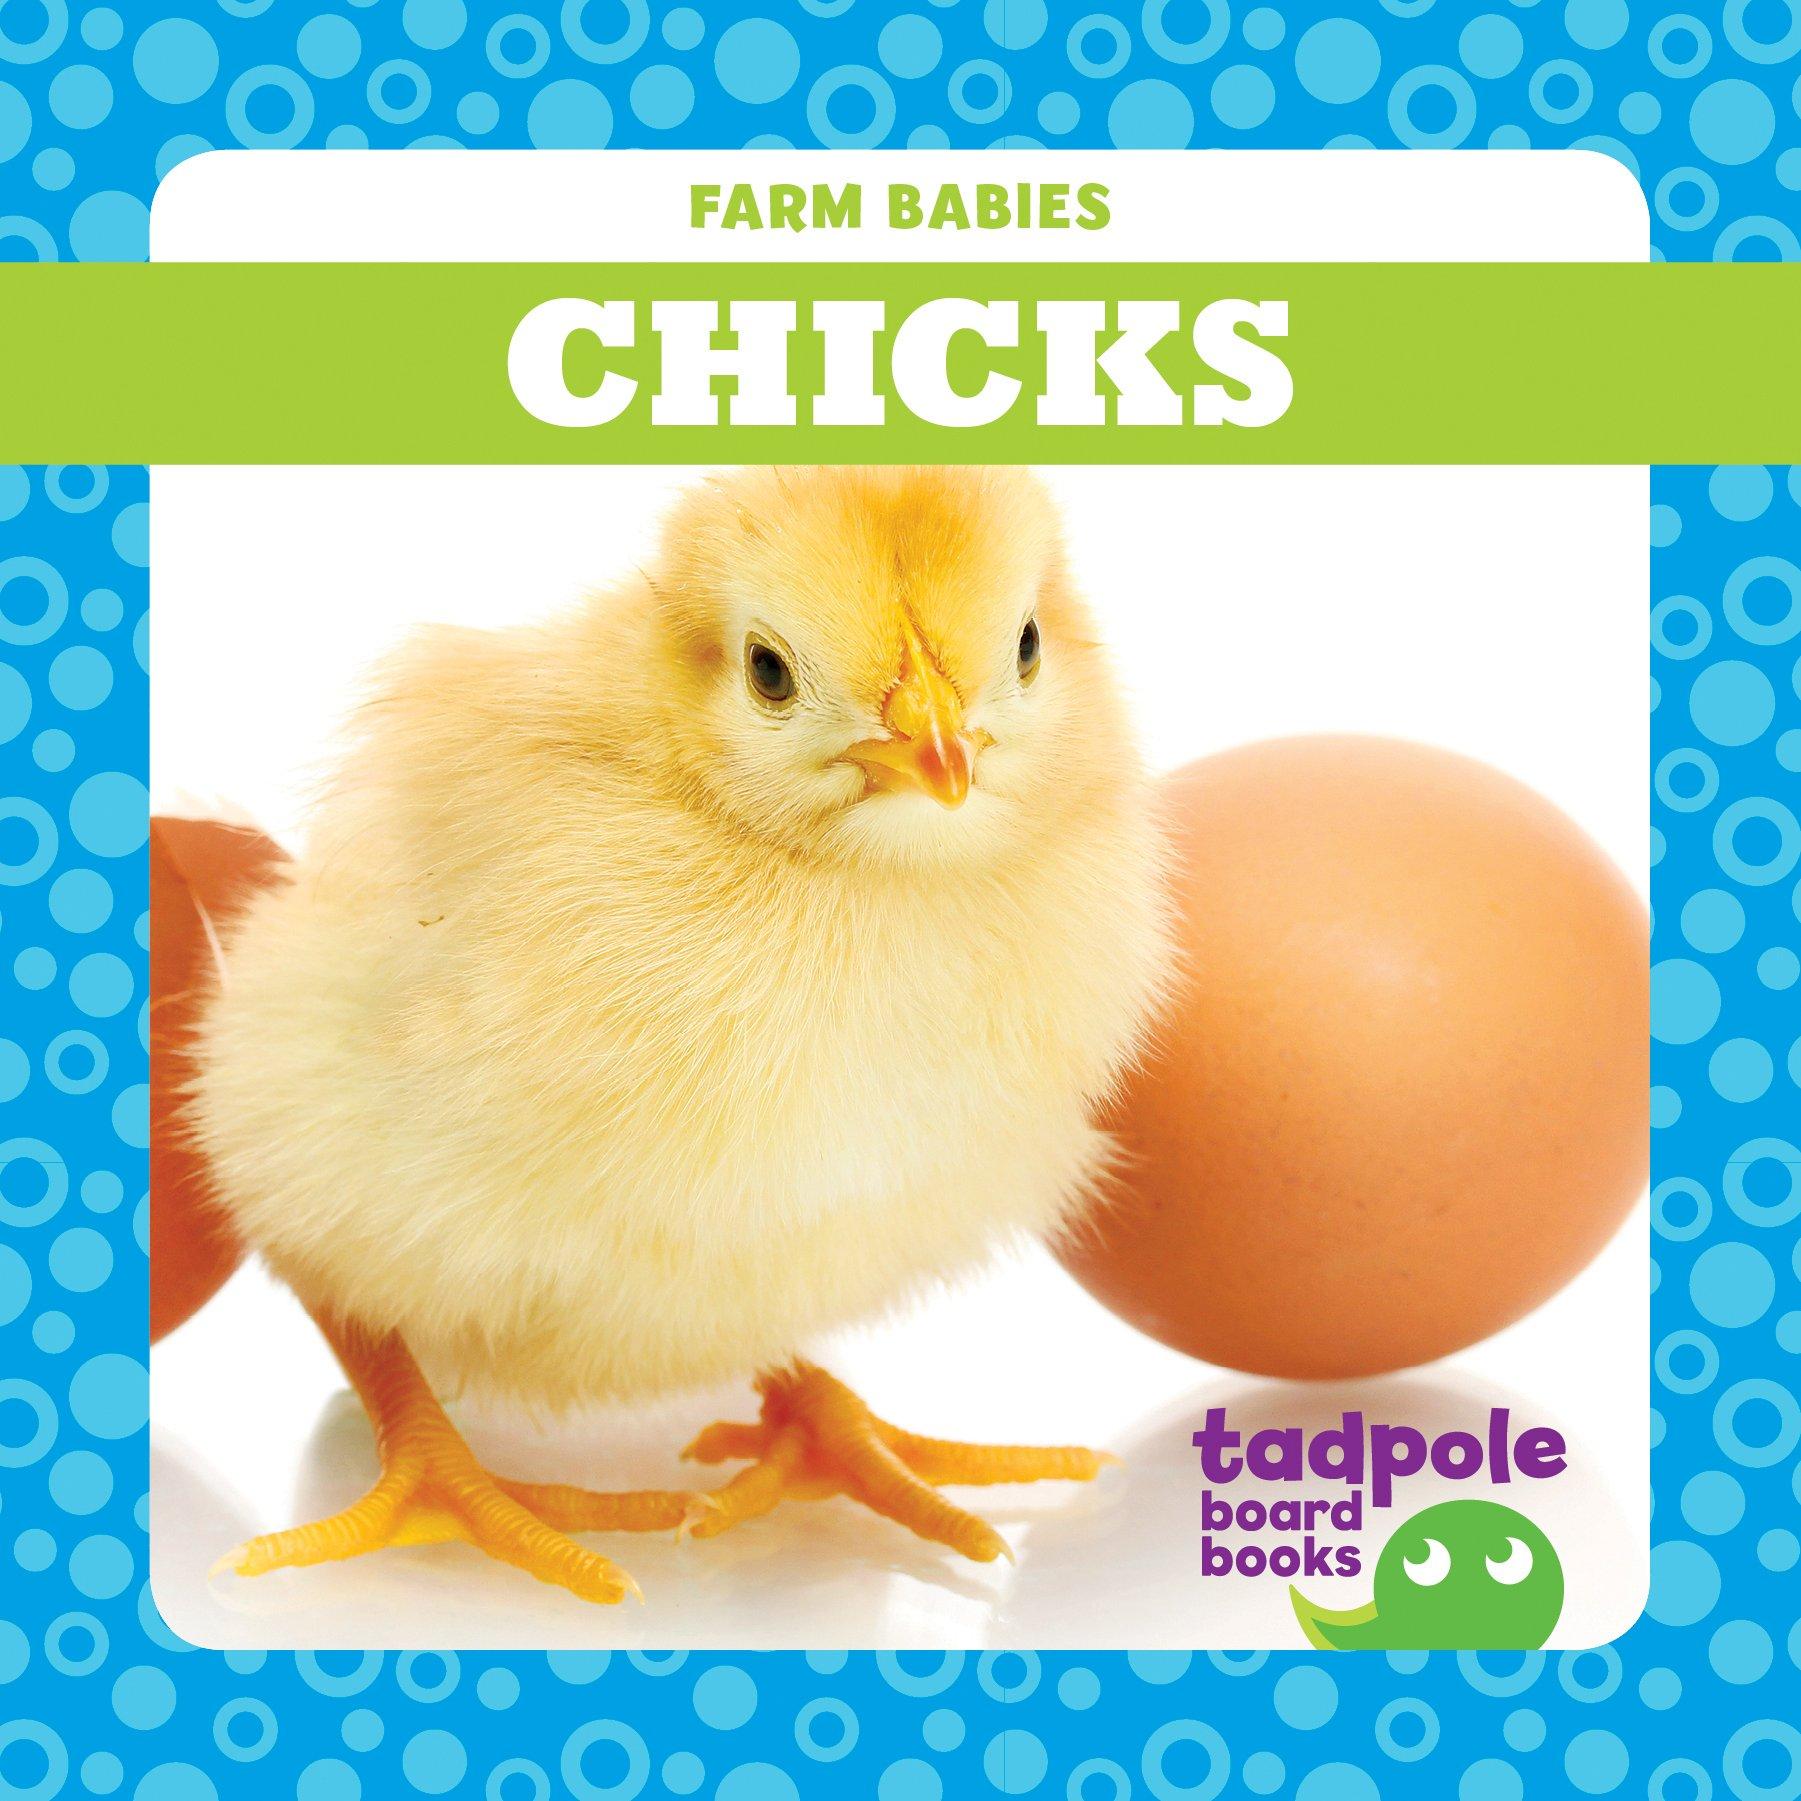 Download Chicks (Tadpole Board Books: Farm Babies) pdf